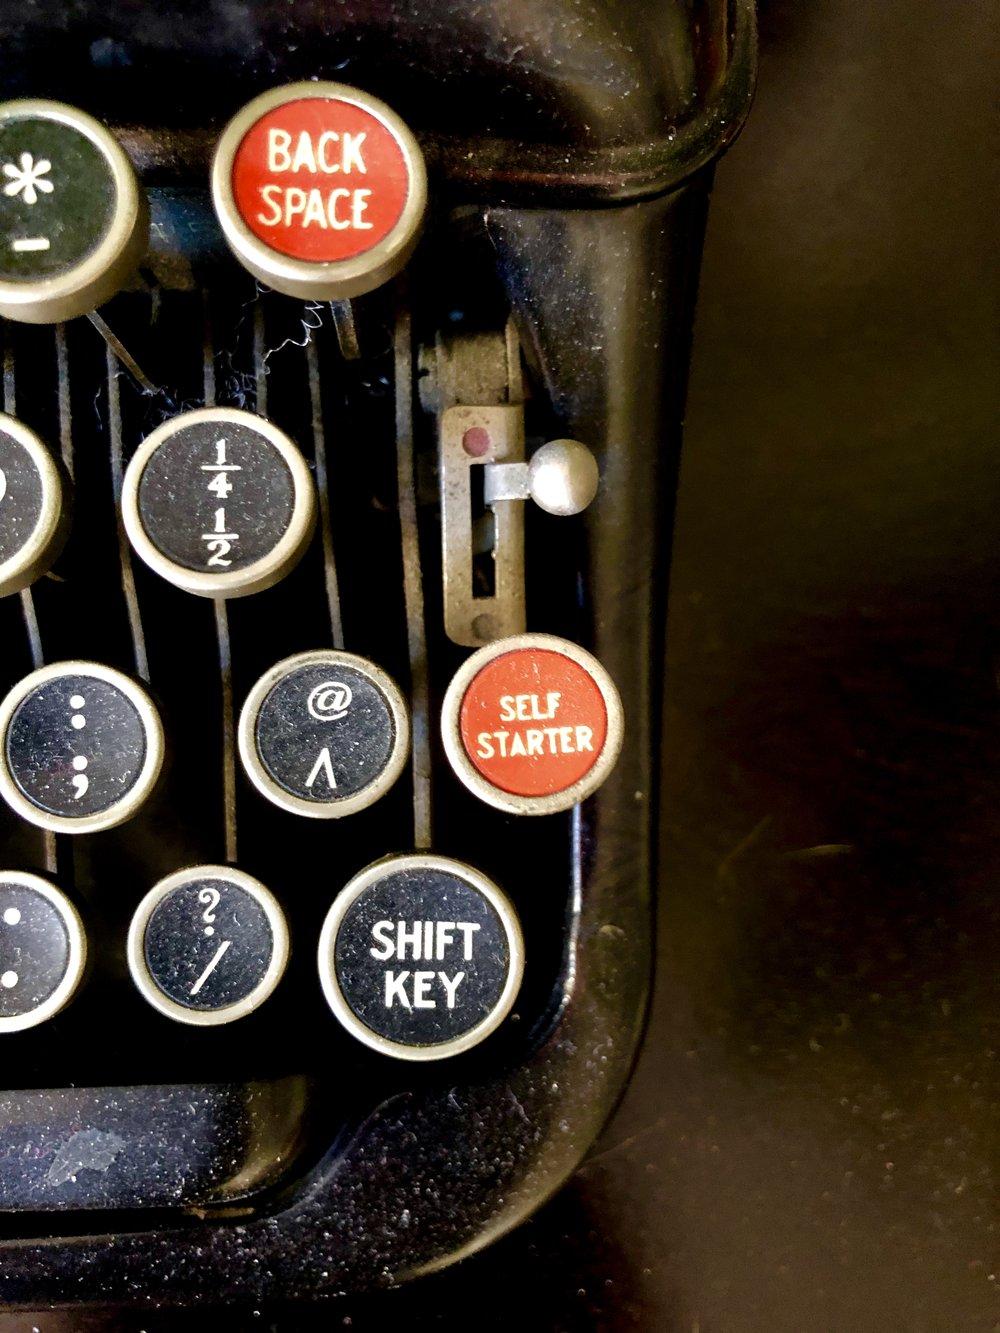 My typewriter that I absolutely do not use. Photo by Martine Audet.